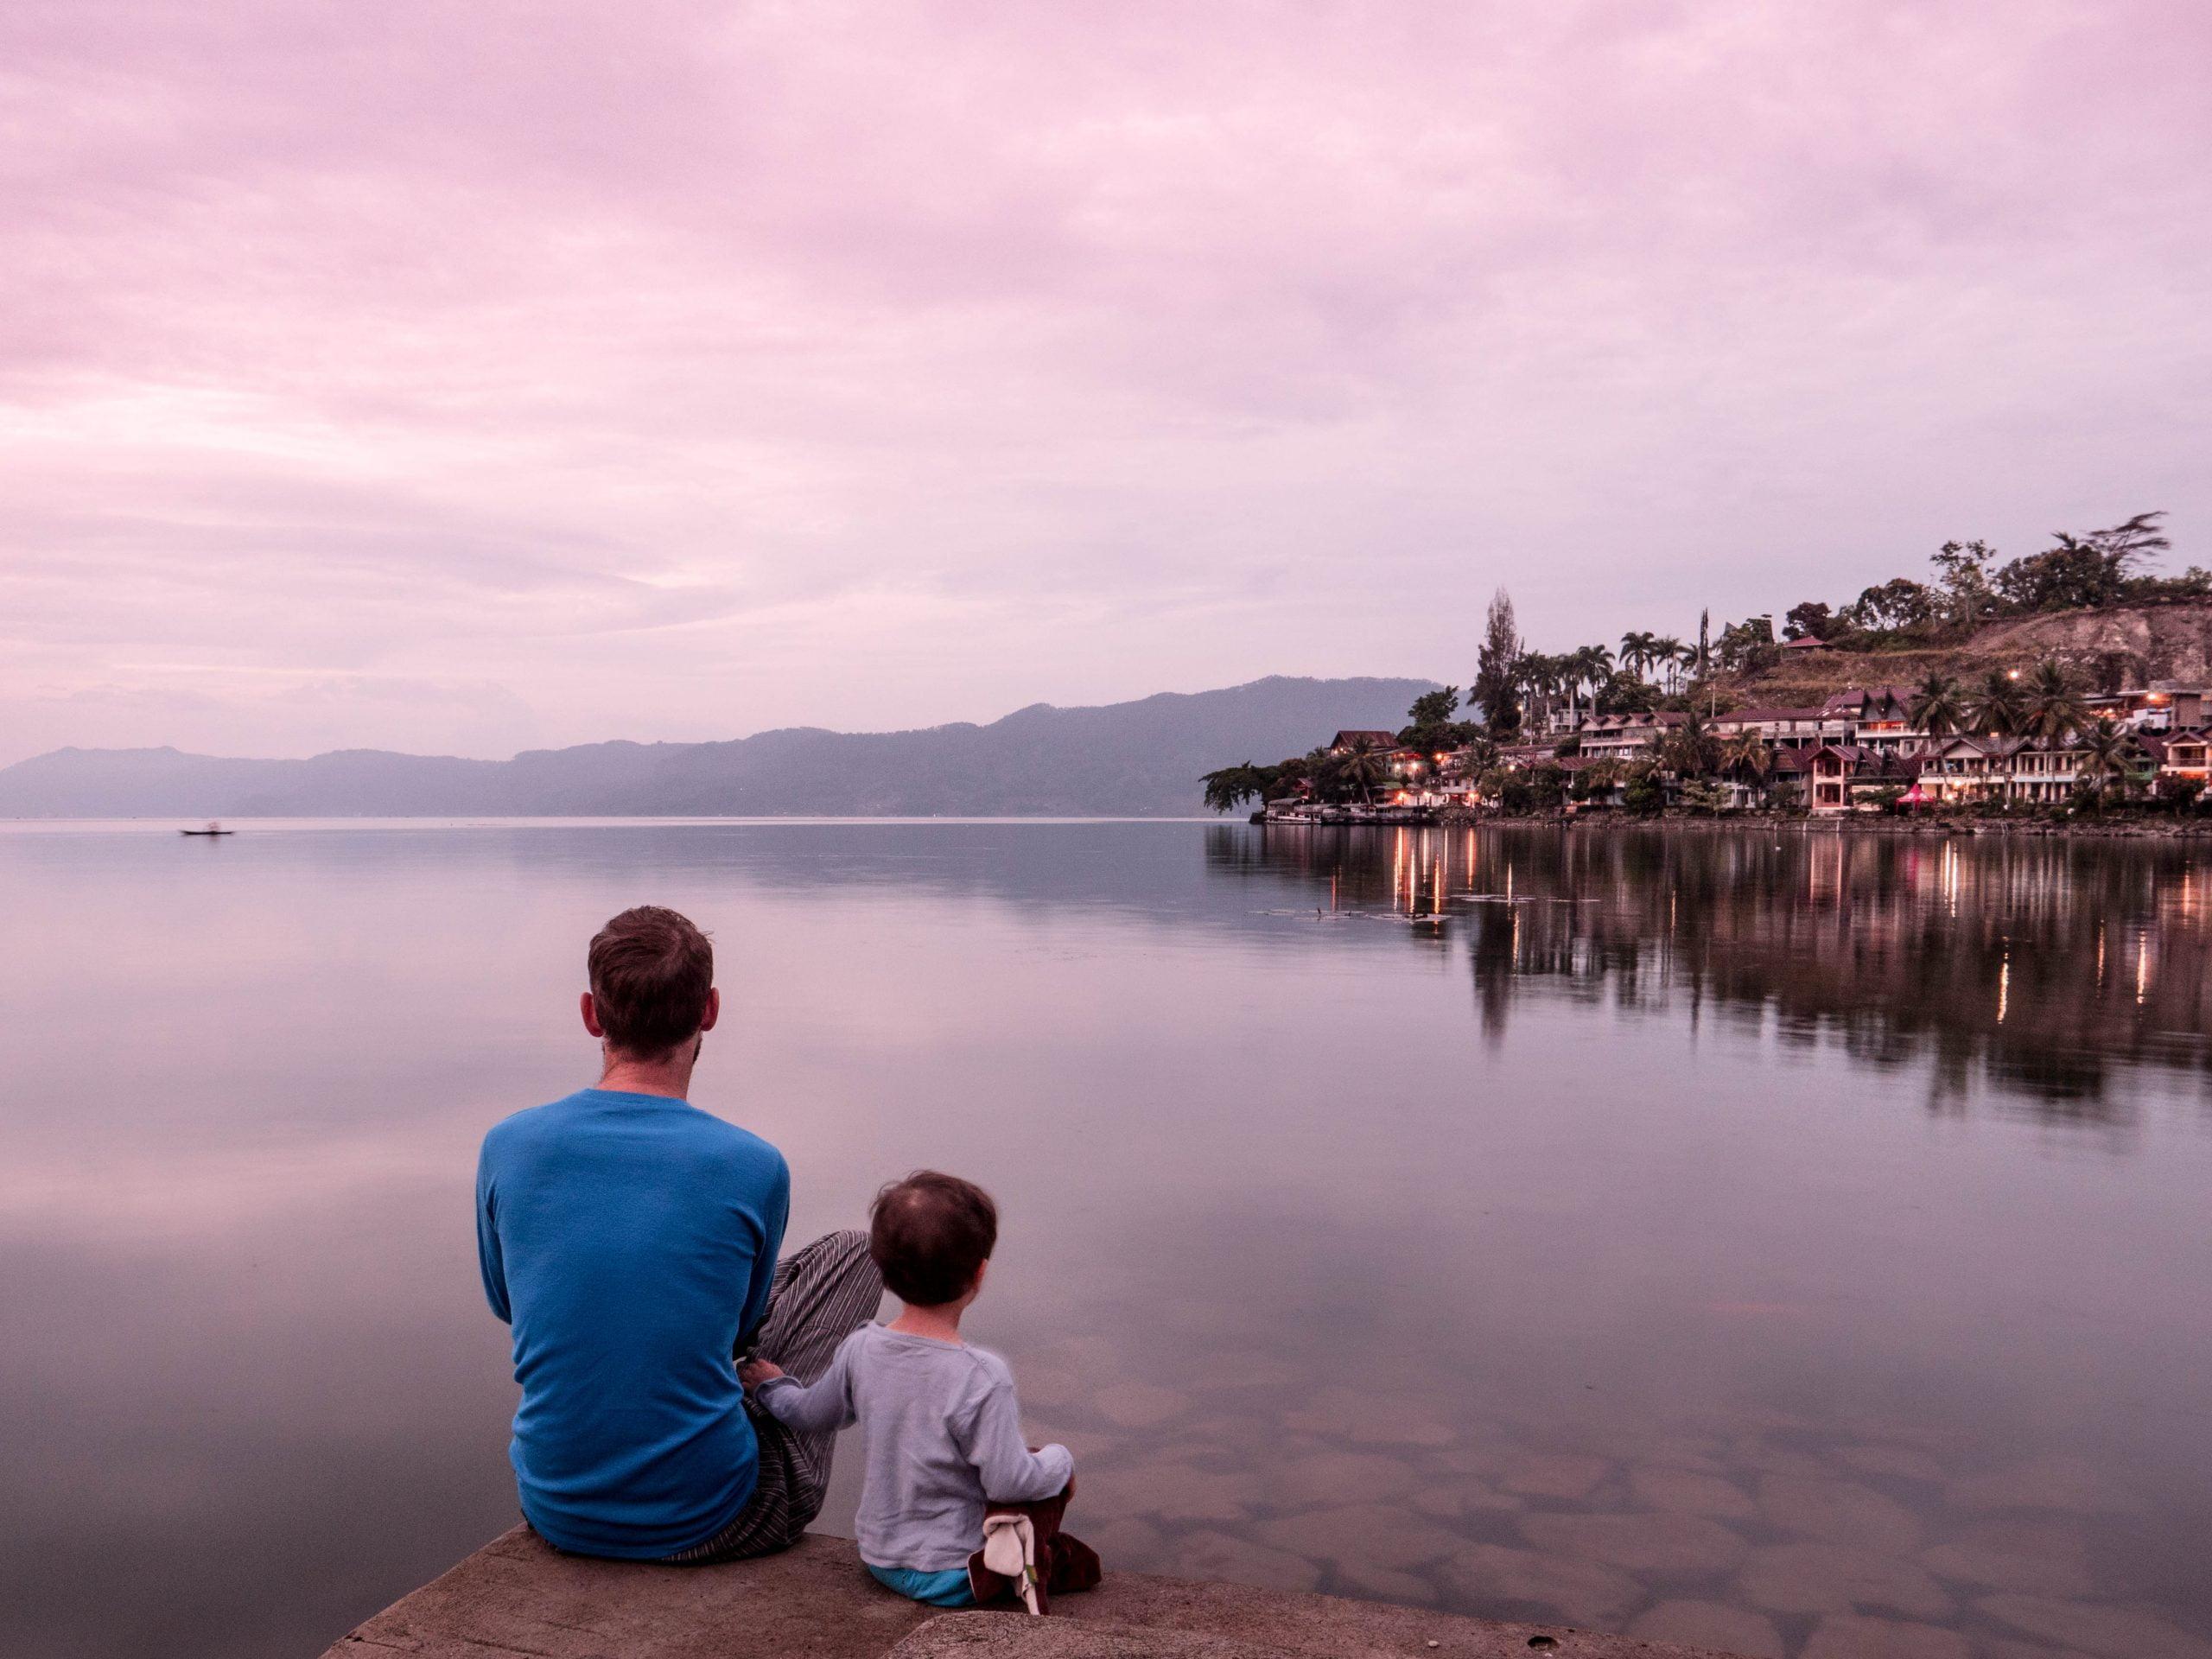 lac toba SH village scaled - Les globe blogueurs - blog voyage nature